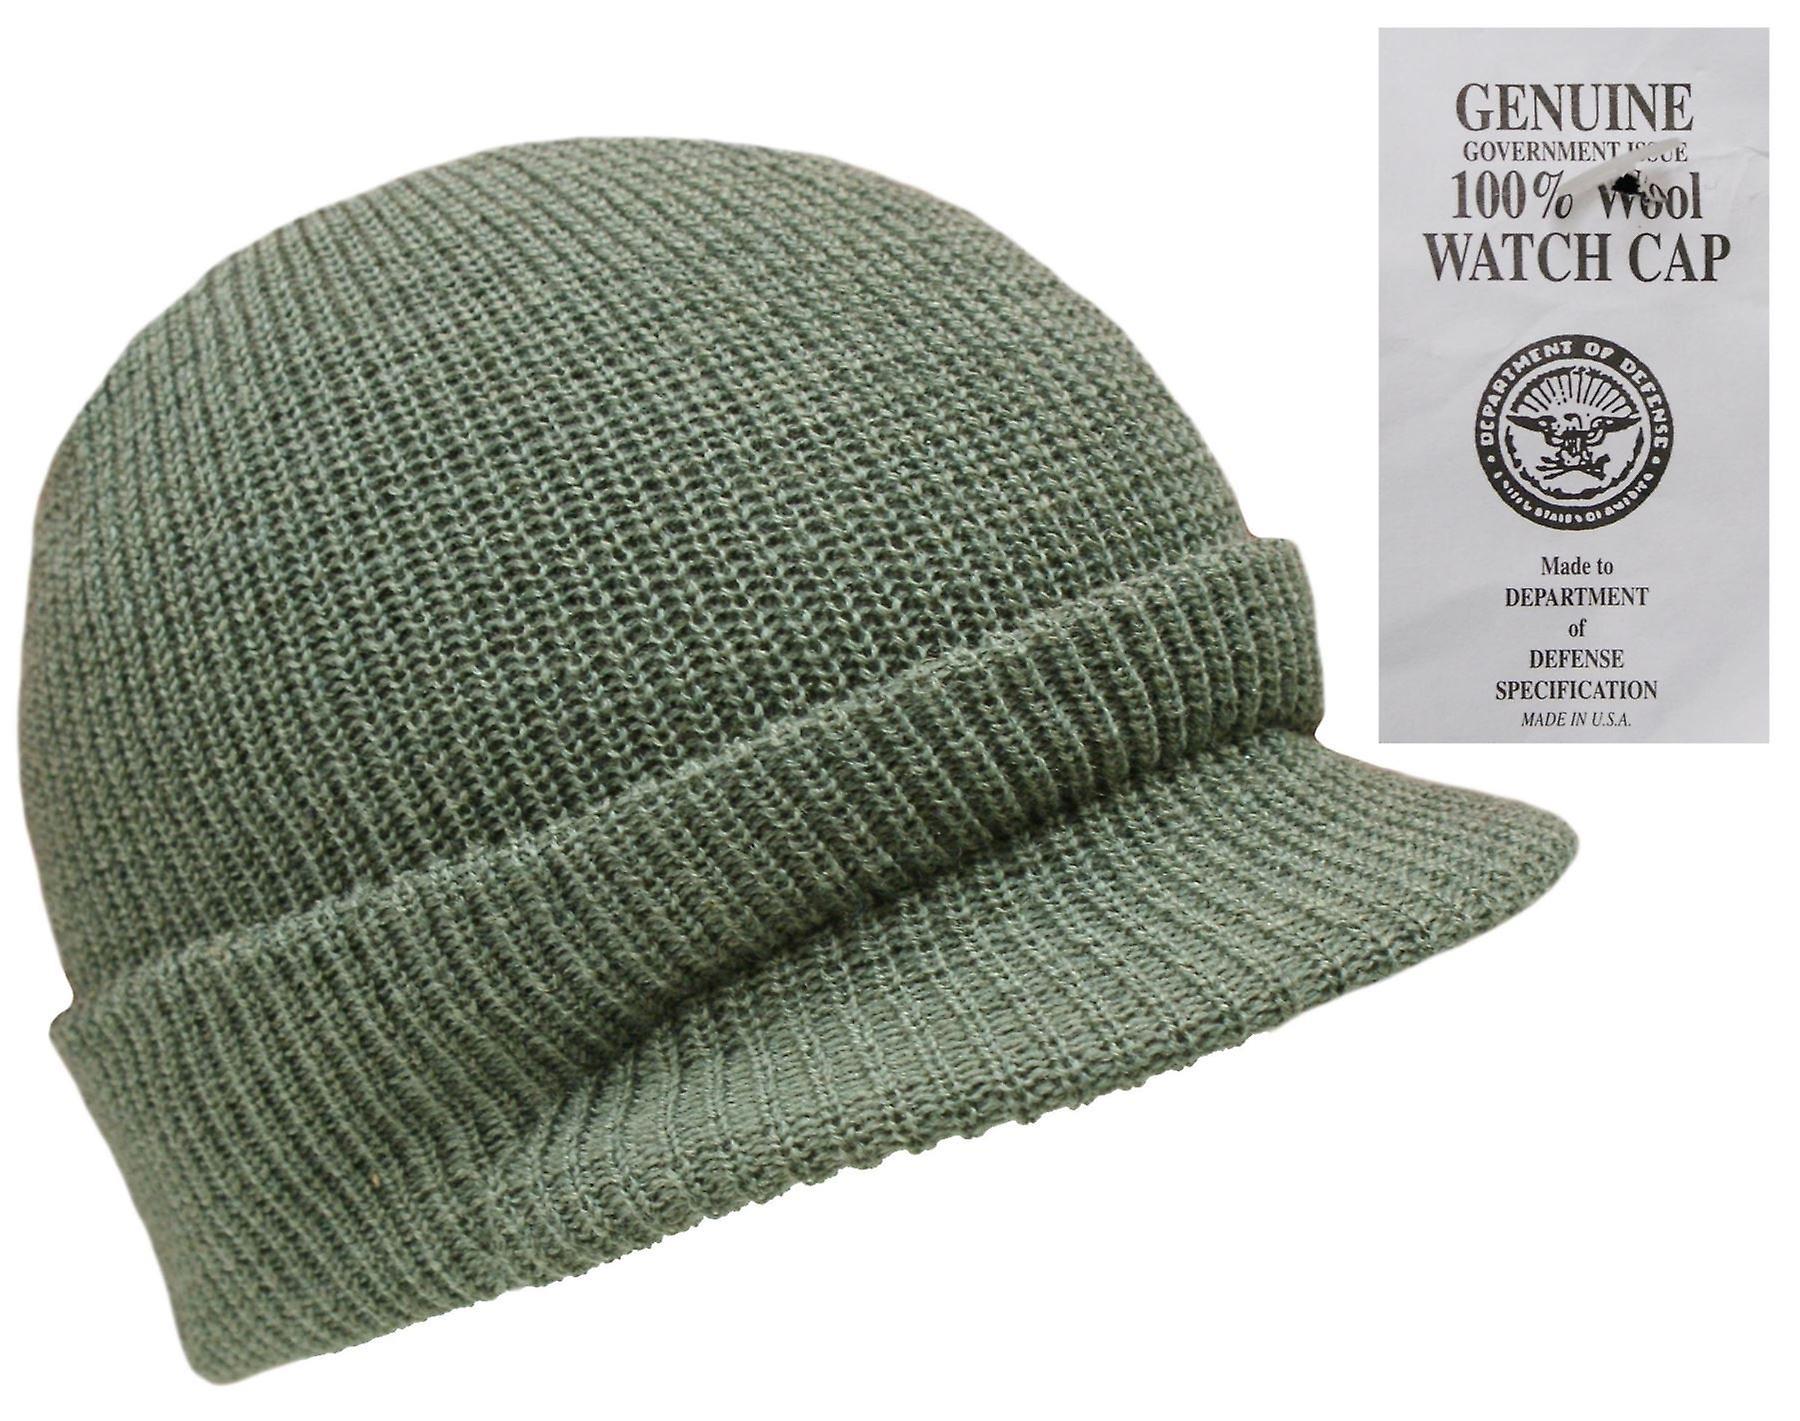 669aa24ebbef39 New Peaked 100% Wool Hat Us Army Watch Cap Beanie | Fruugo